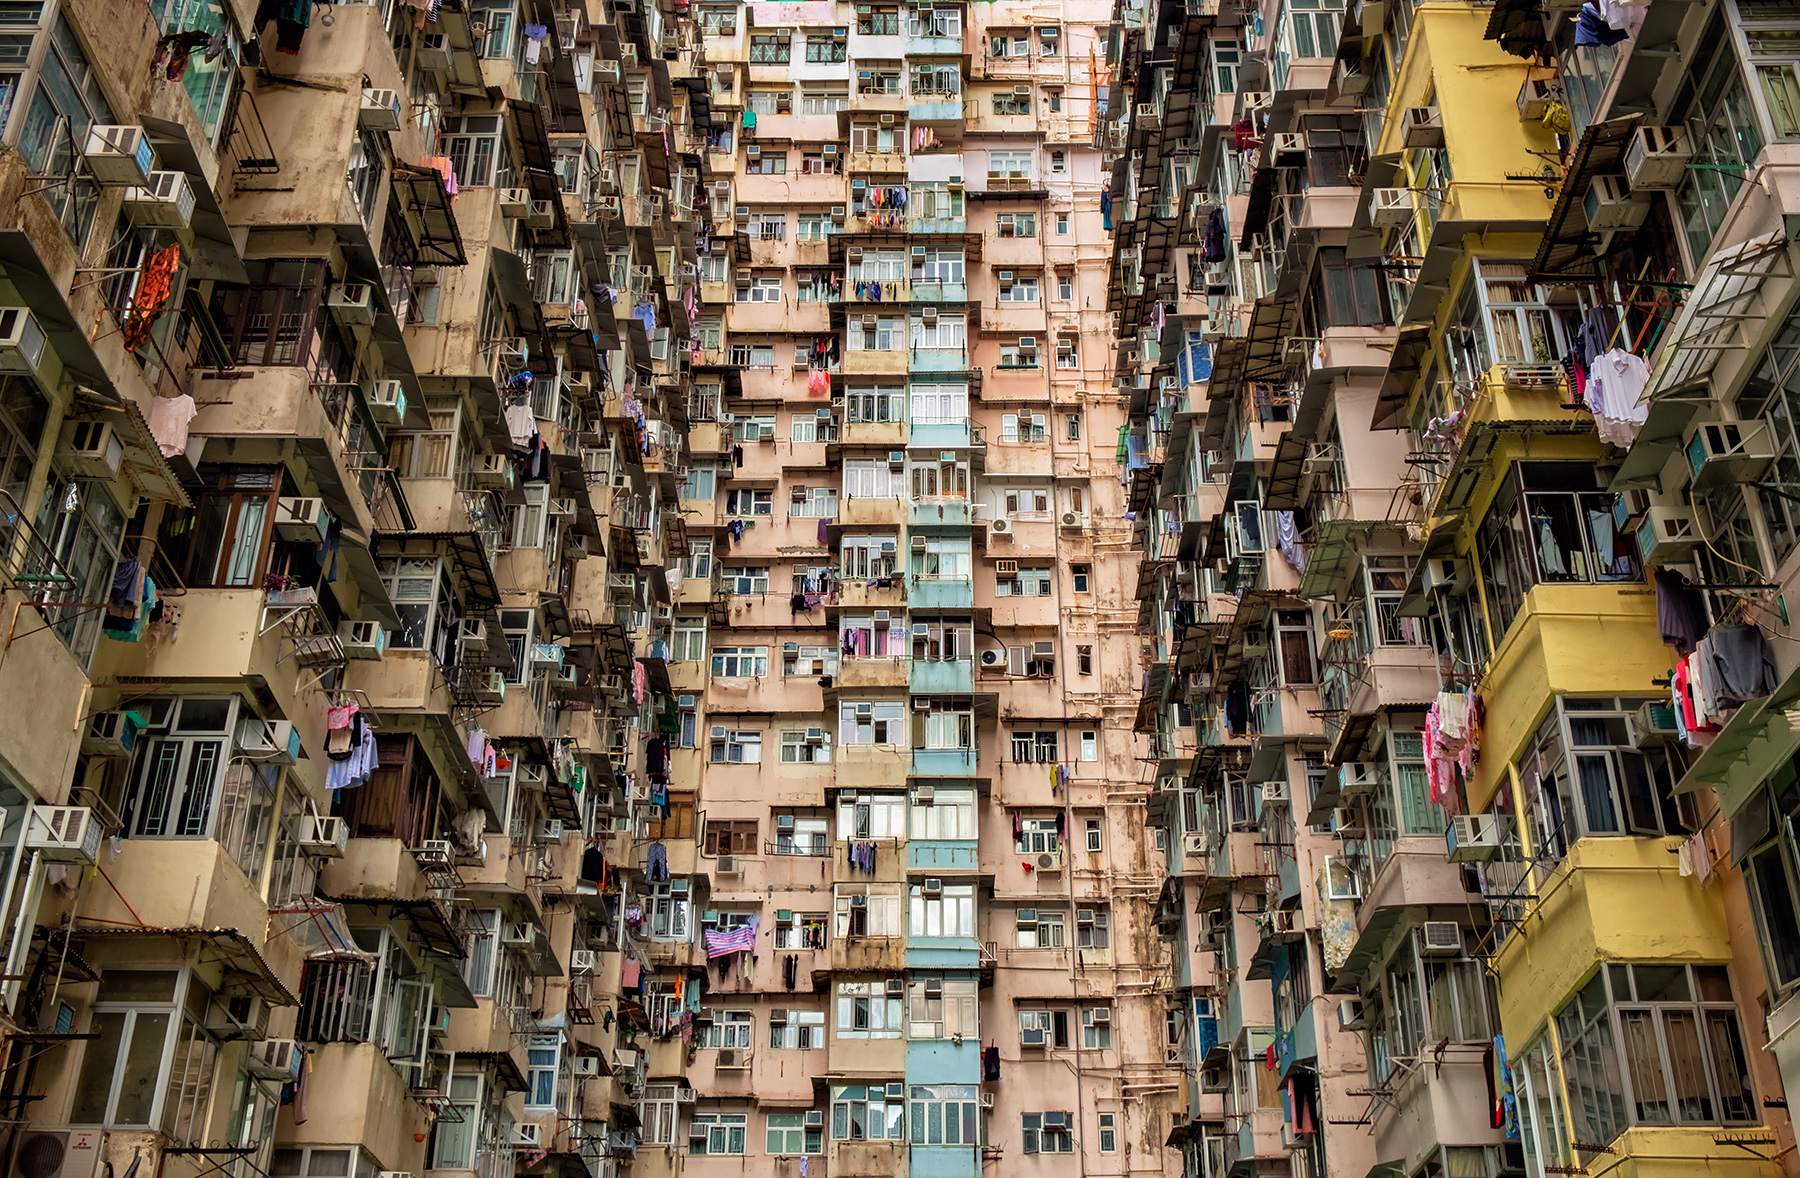 Doug_Caplan_Hong-Kong-Brutal-Compressions_Untitled_01.jpg